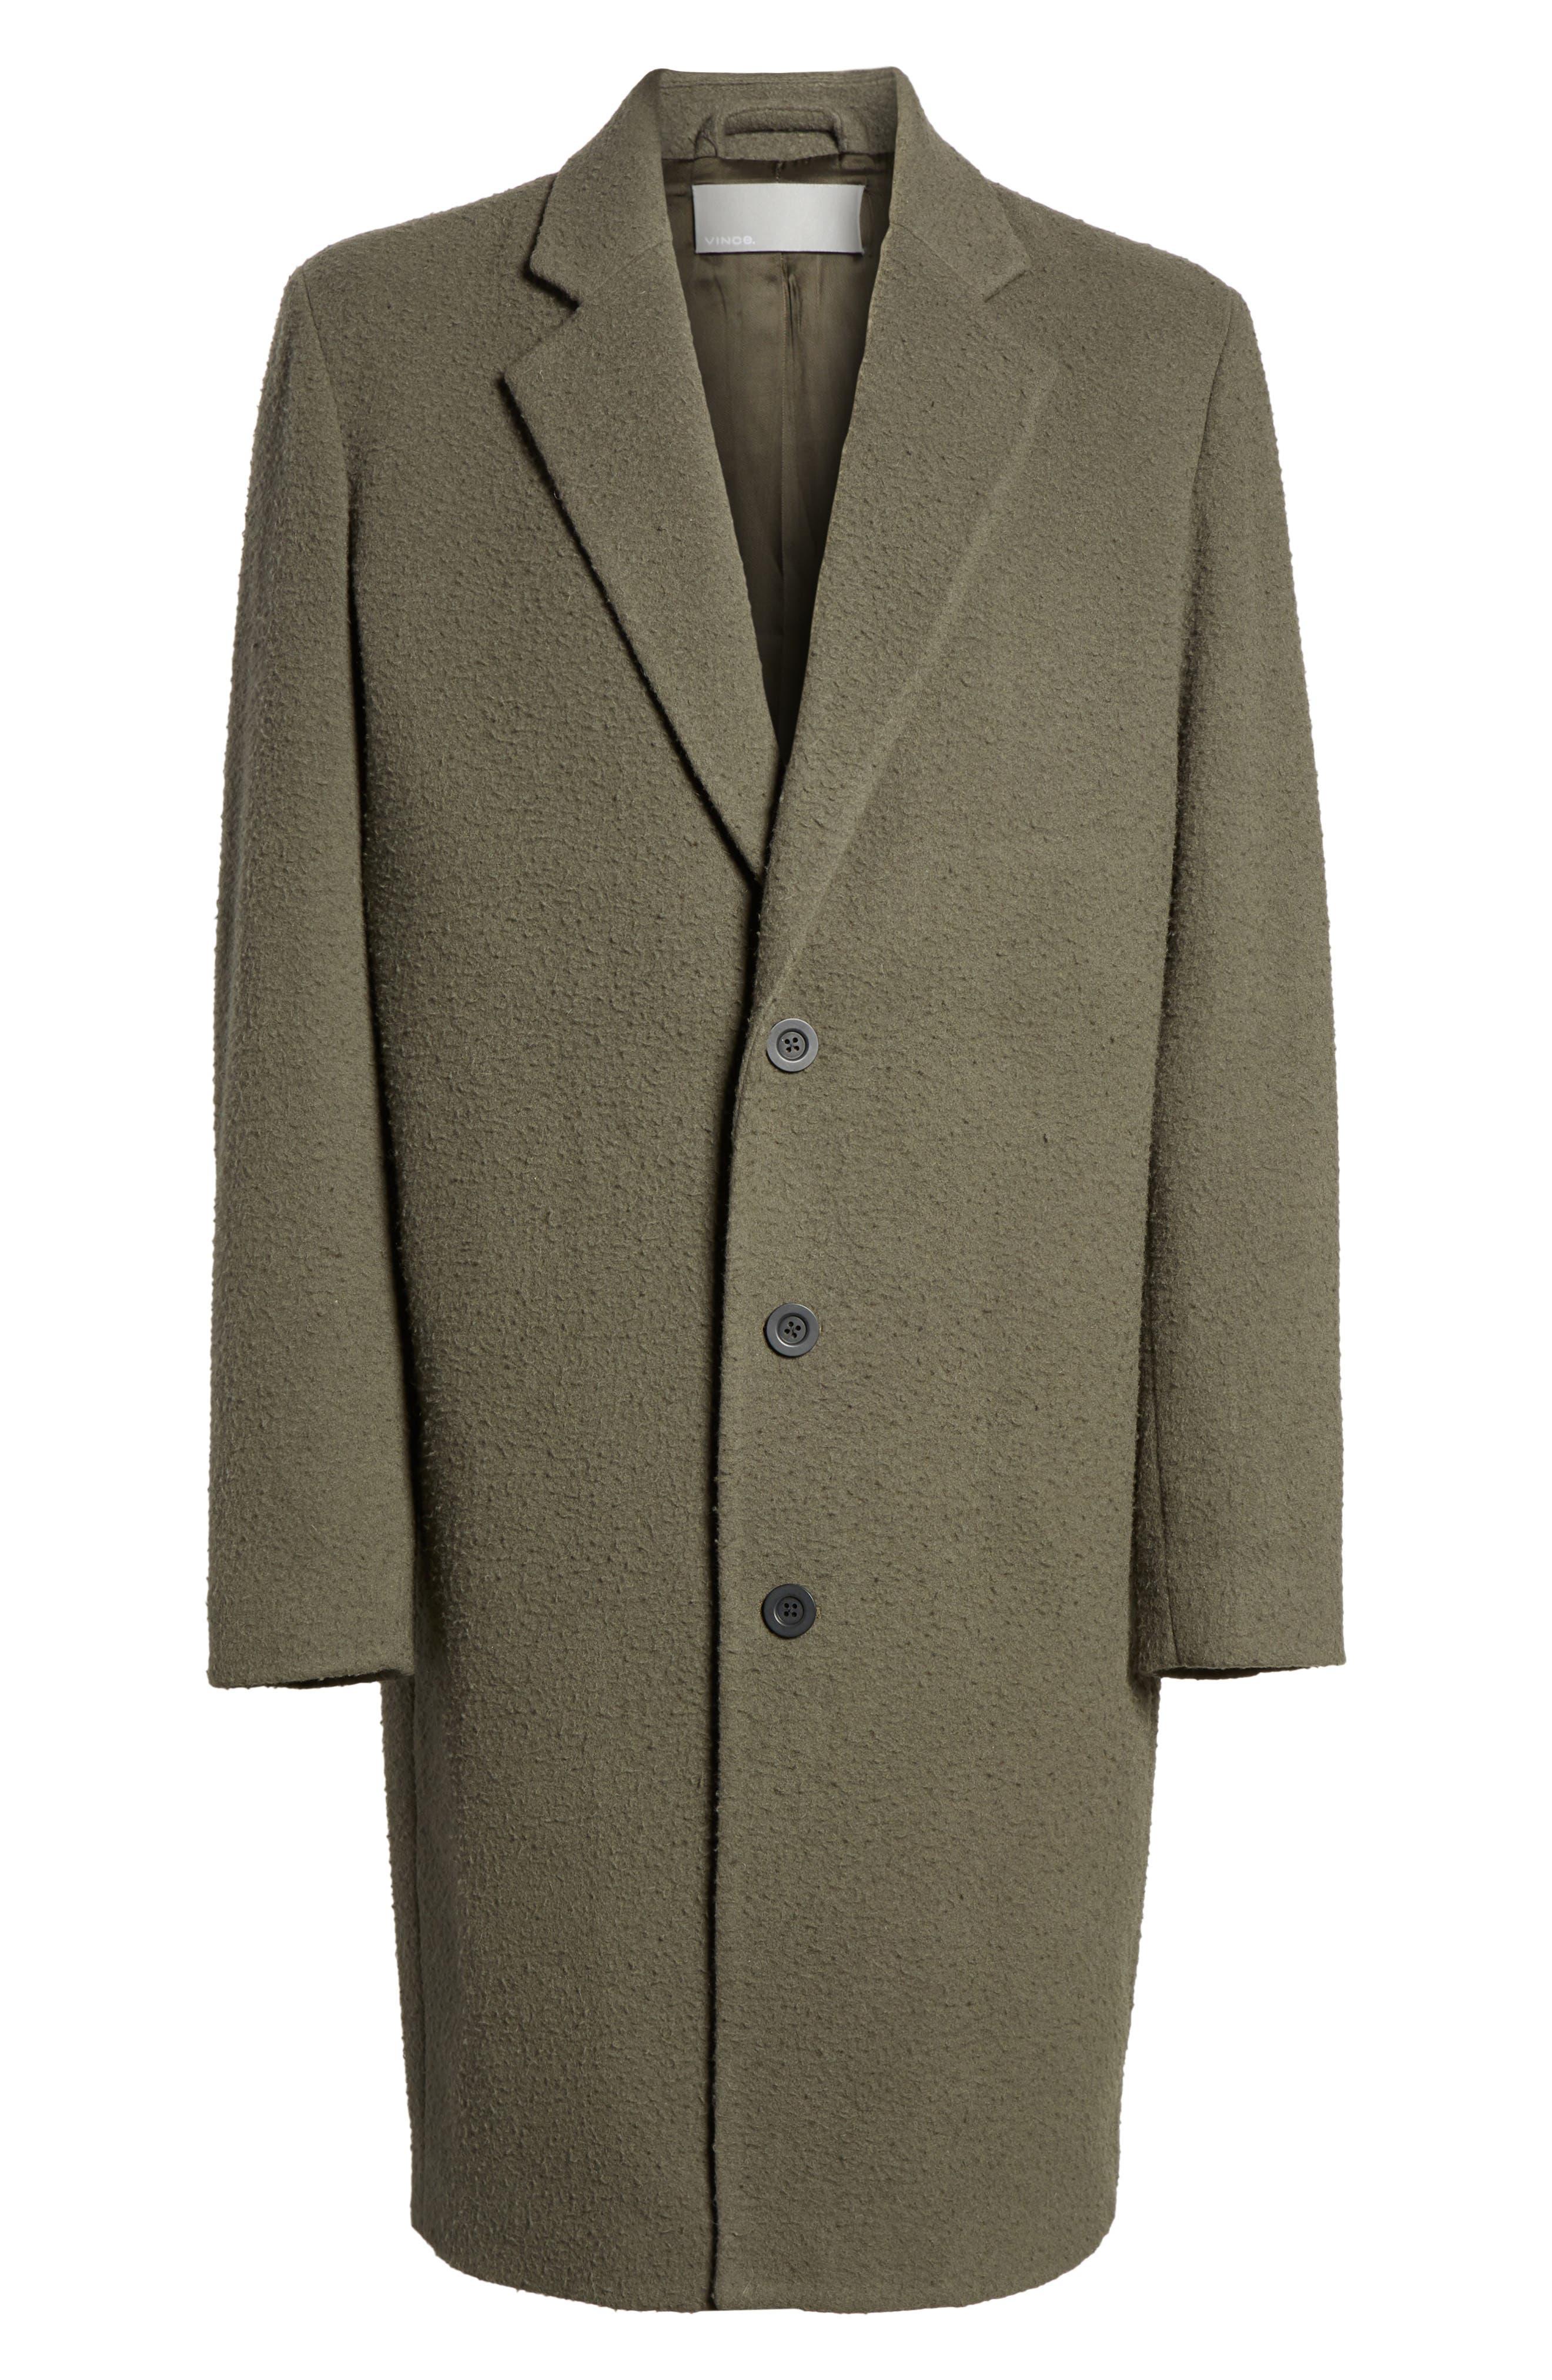 Distressed Wool Blend Car Coat,                             Alternate thumbnail 6, color,                             Olive